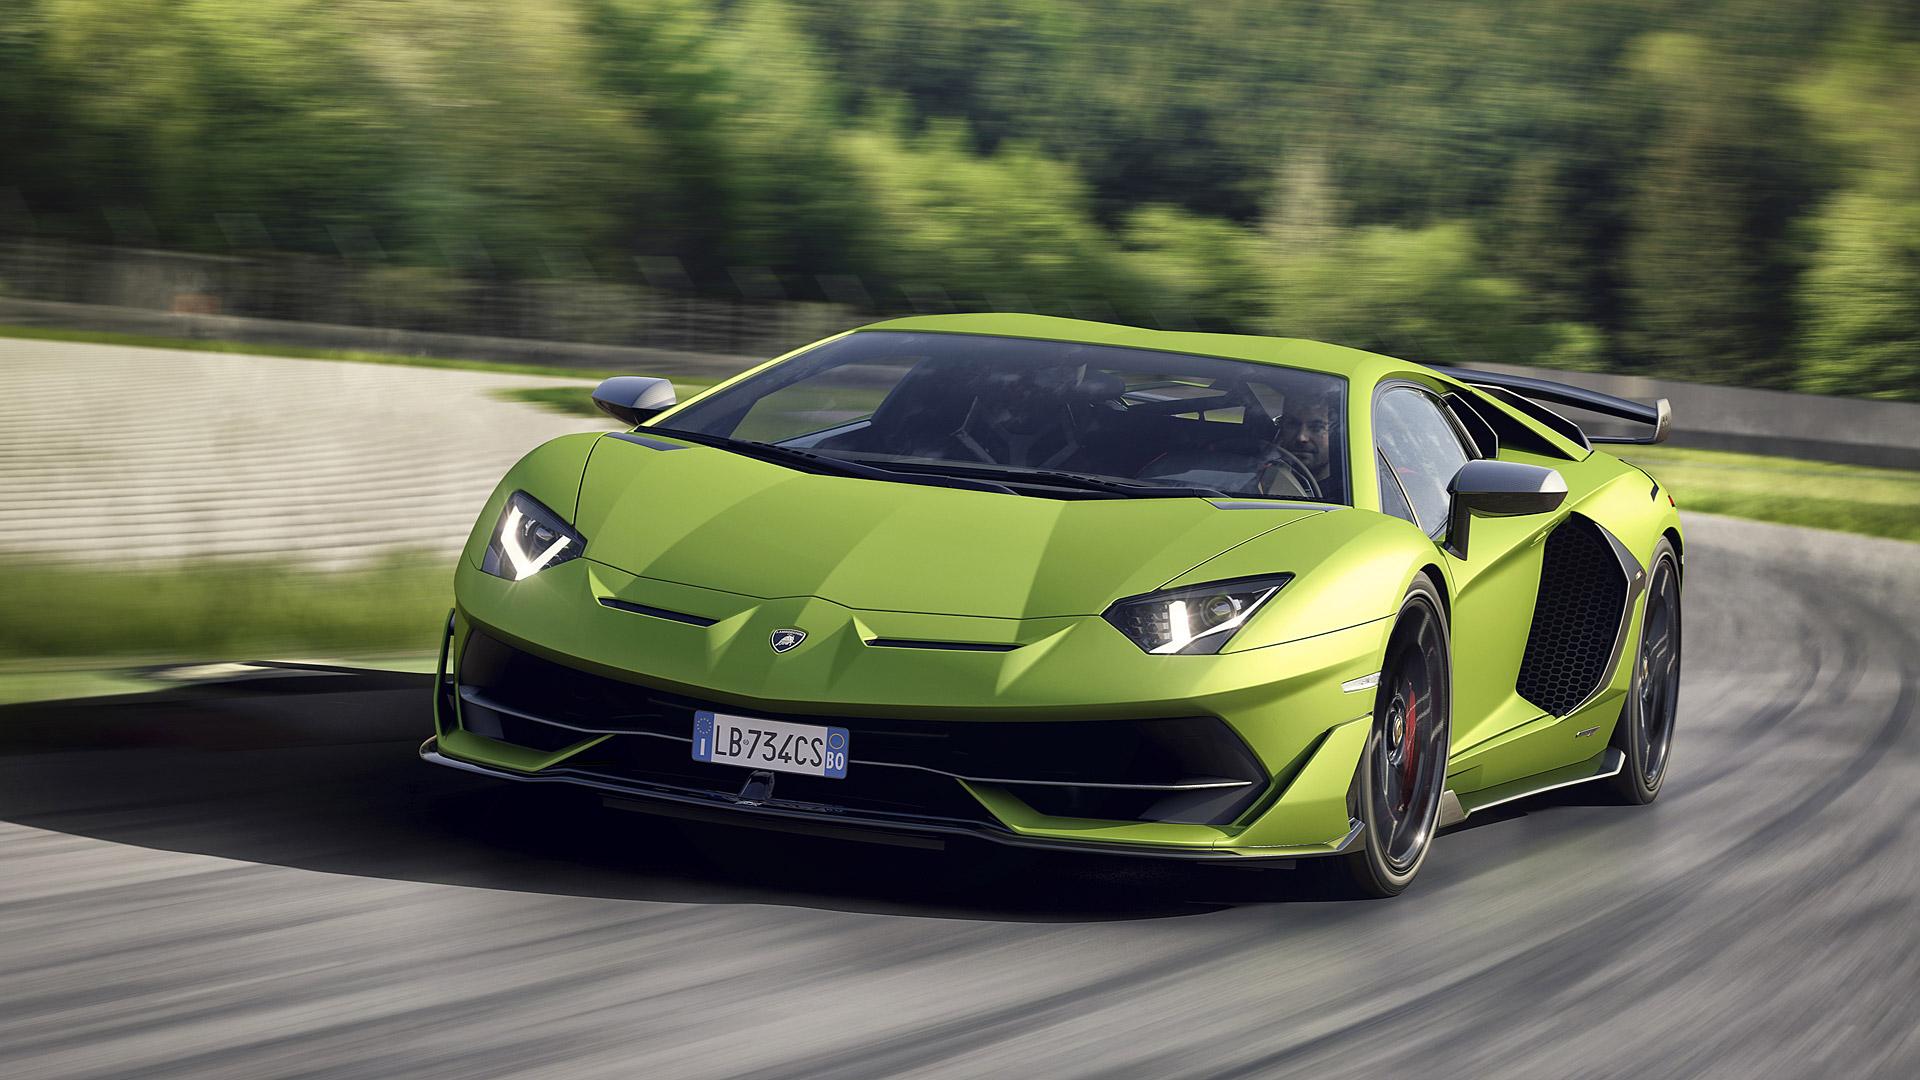 Green Lamborghini Aventador Wallpaper 66269 1920x1080px